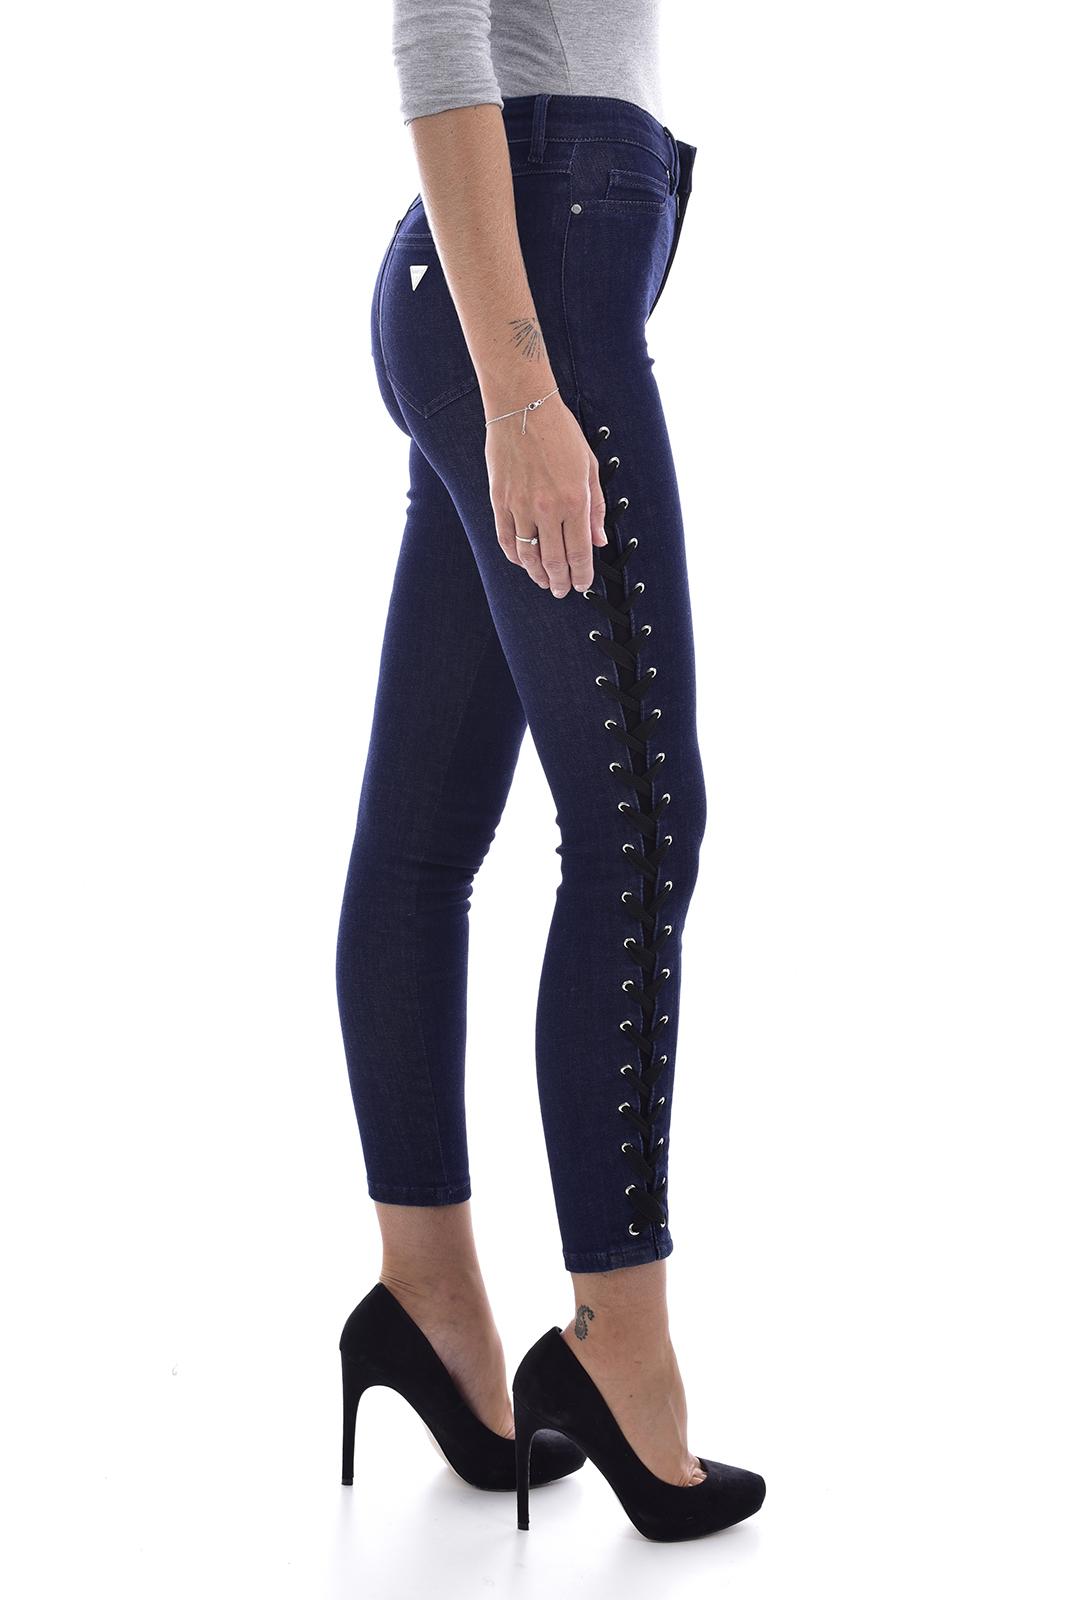 Femme  Guess jeans W81A00D2ZN0 1981 SILVER LAKE